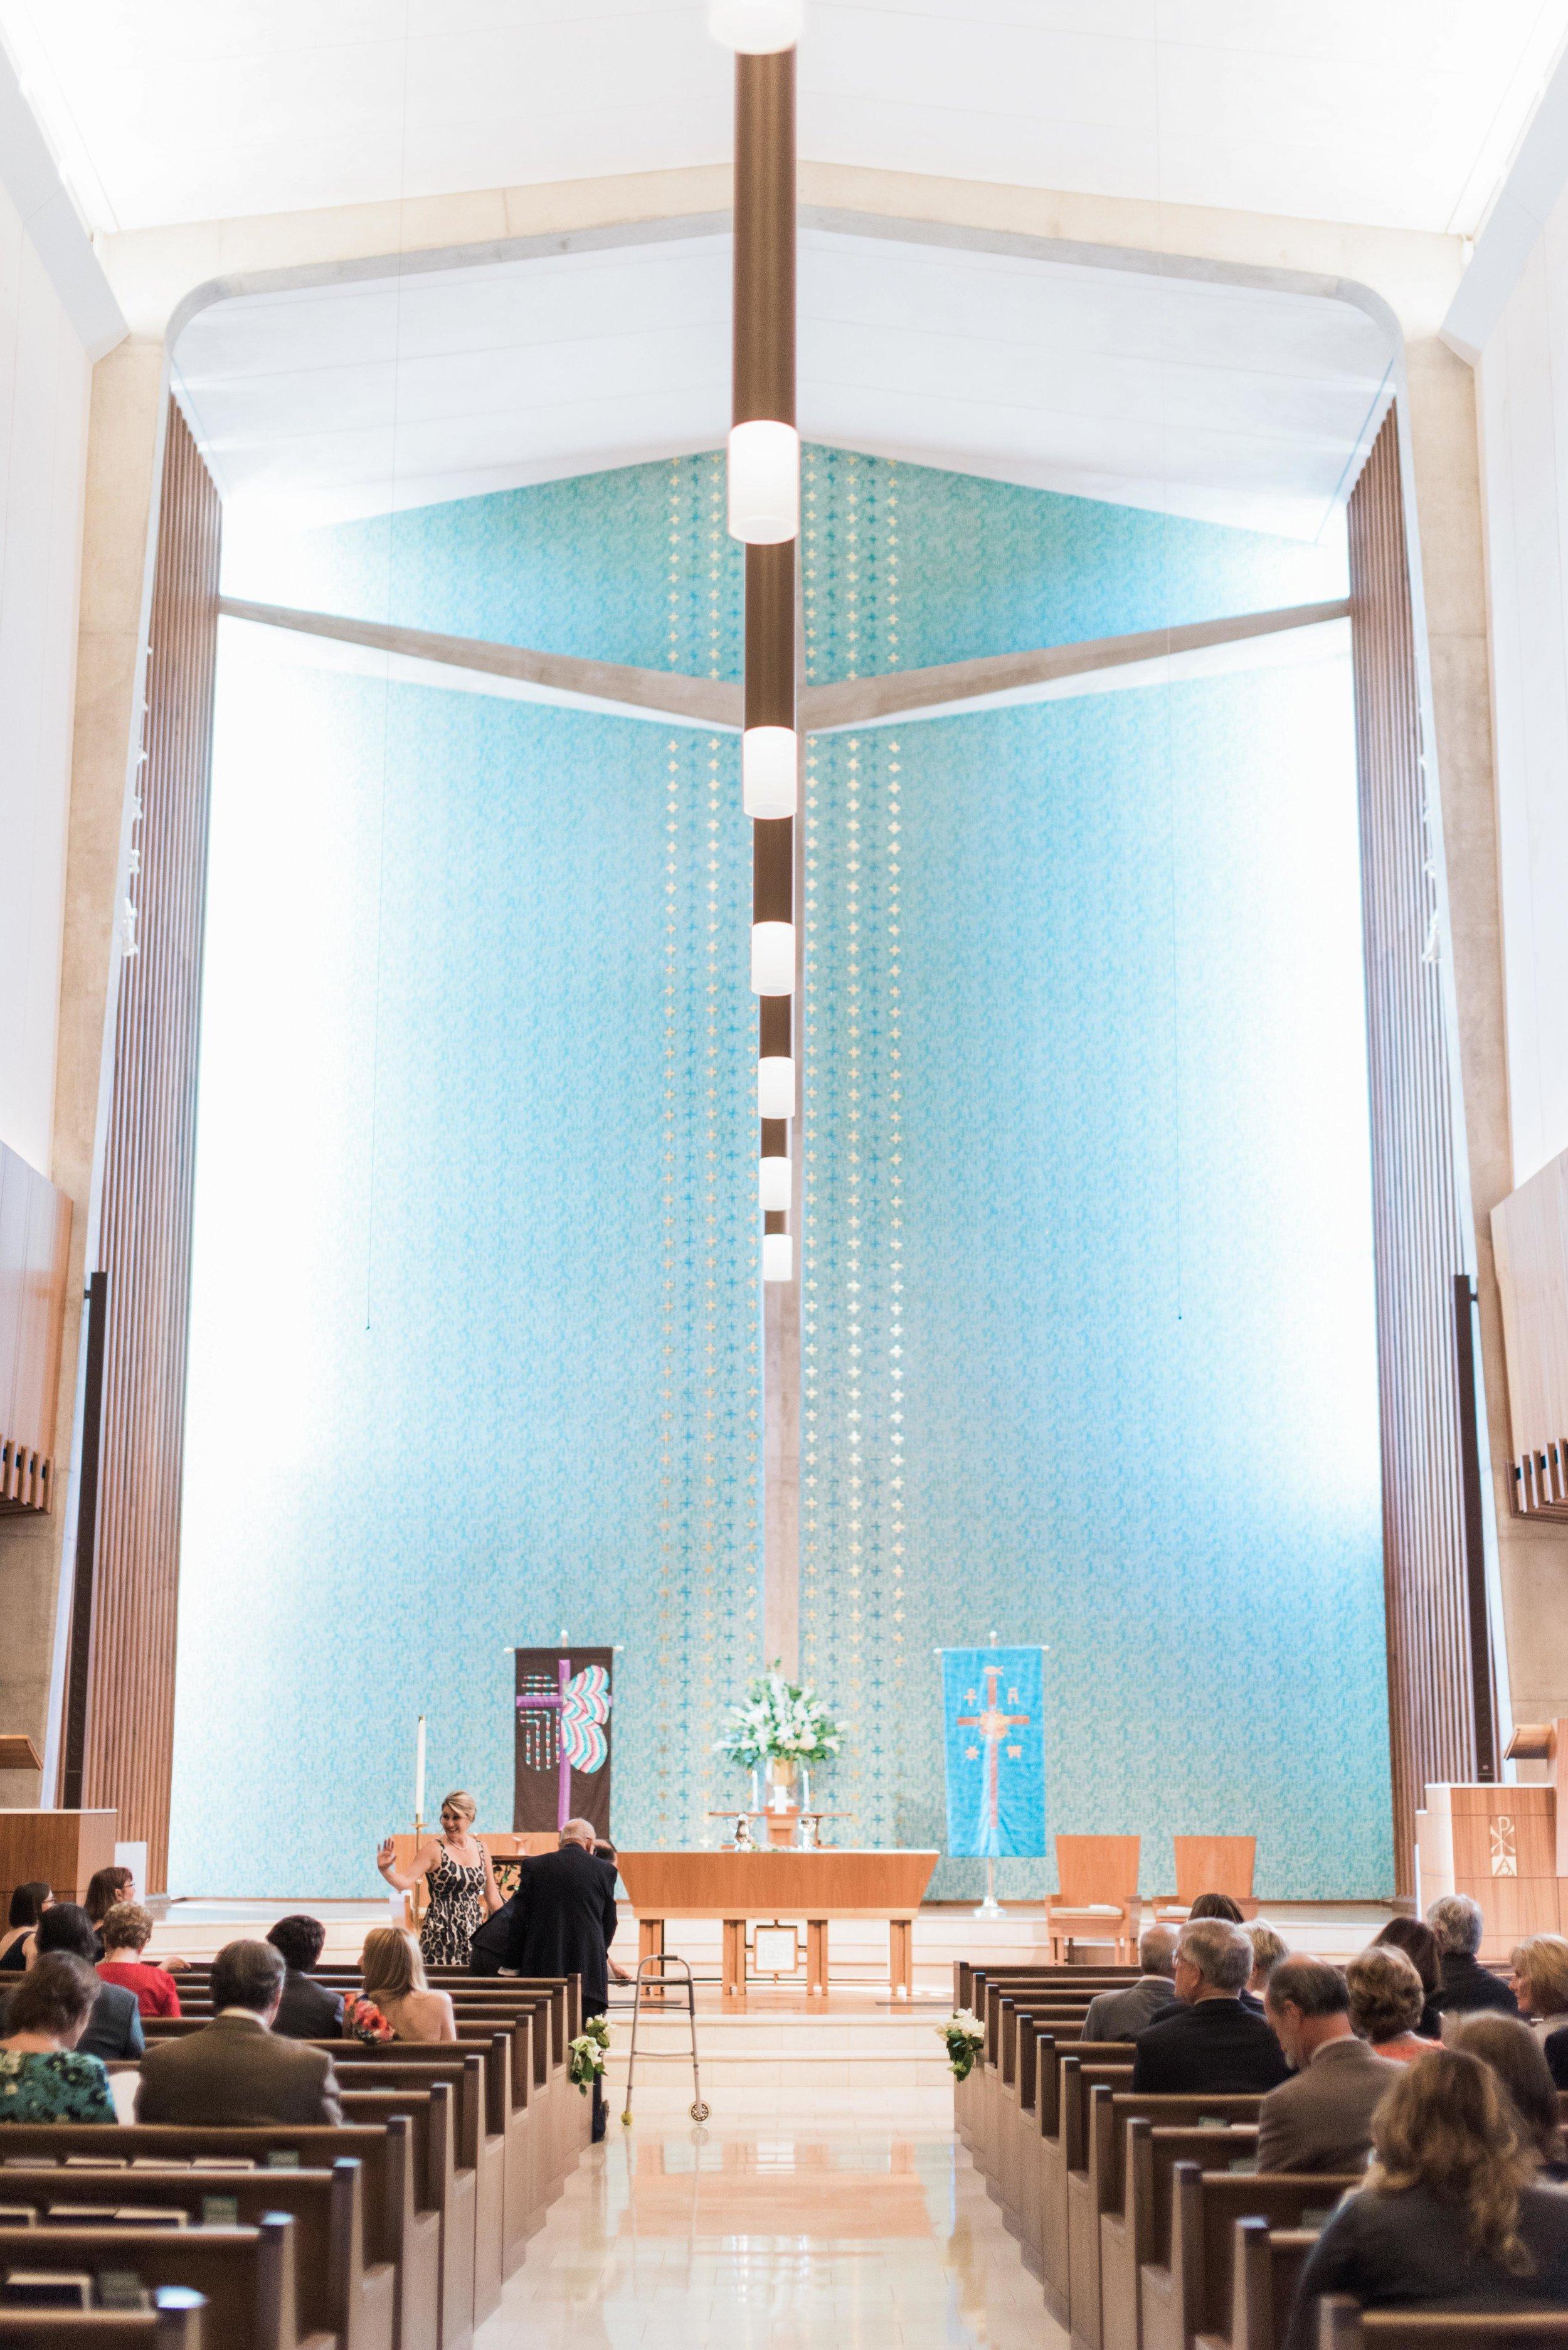 St.-Philip-Presbyterian-Church-Houston-Wedding-Ceremony-The-Junior-League-Of-Houston-Reception-Dana-Fernandez-Photography-Fine-Art-Film-22.jpg